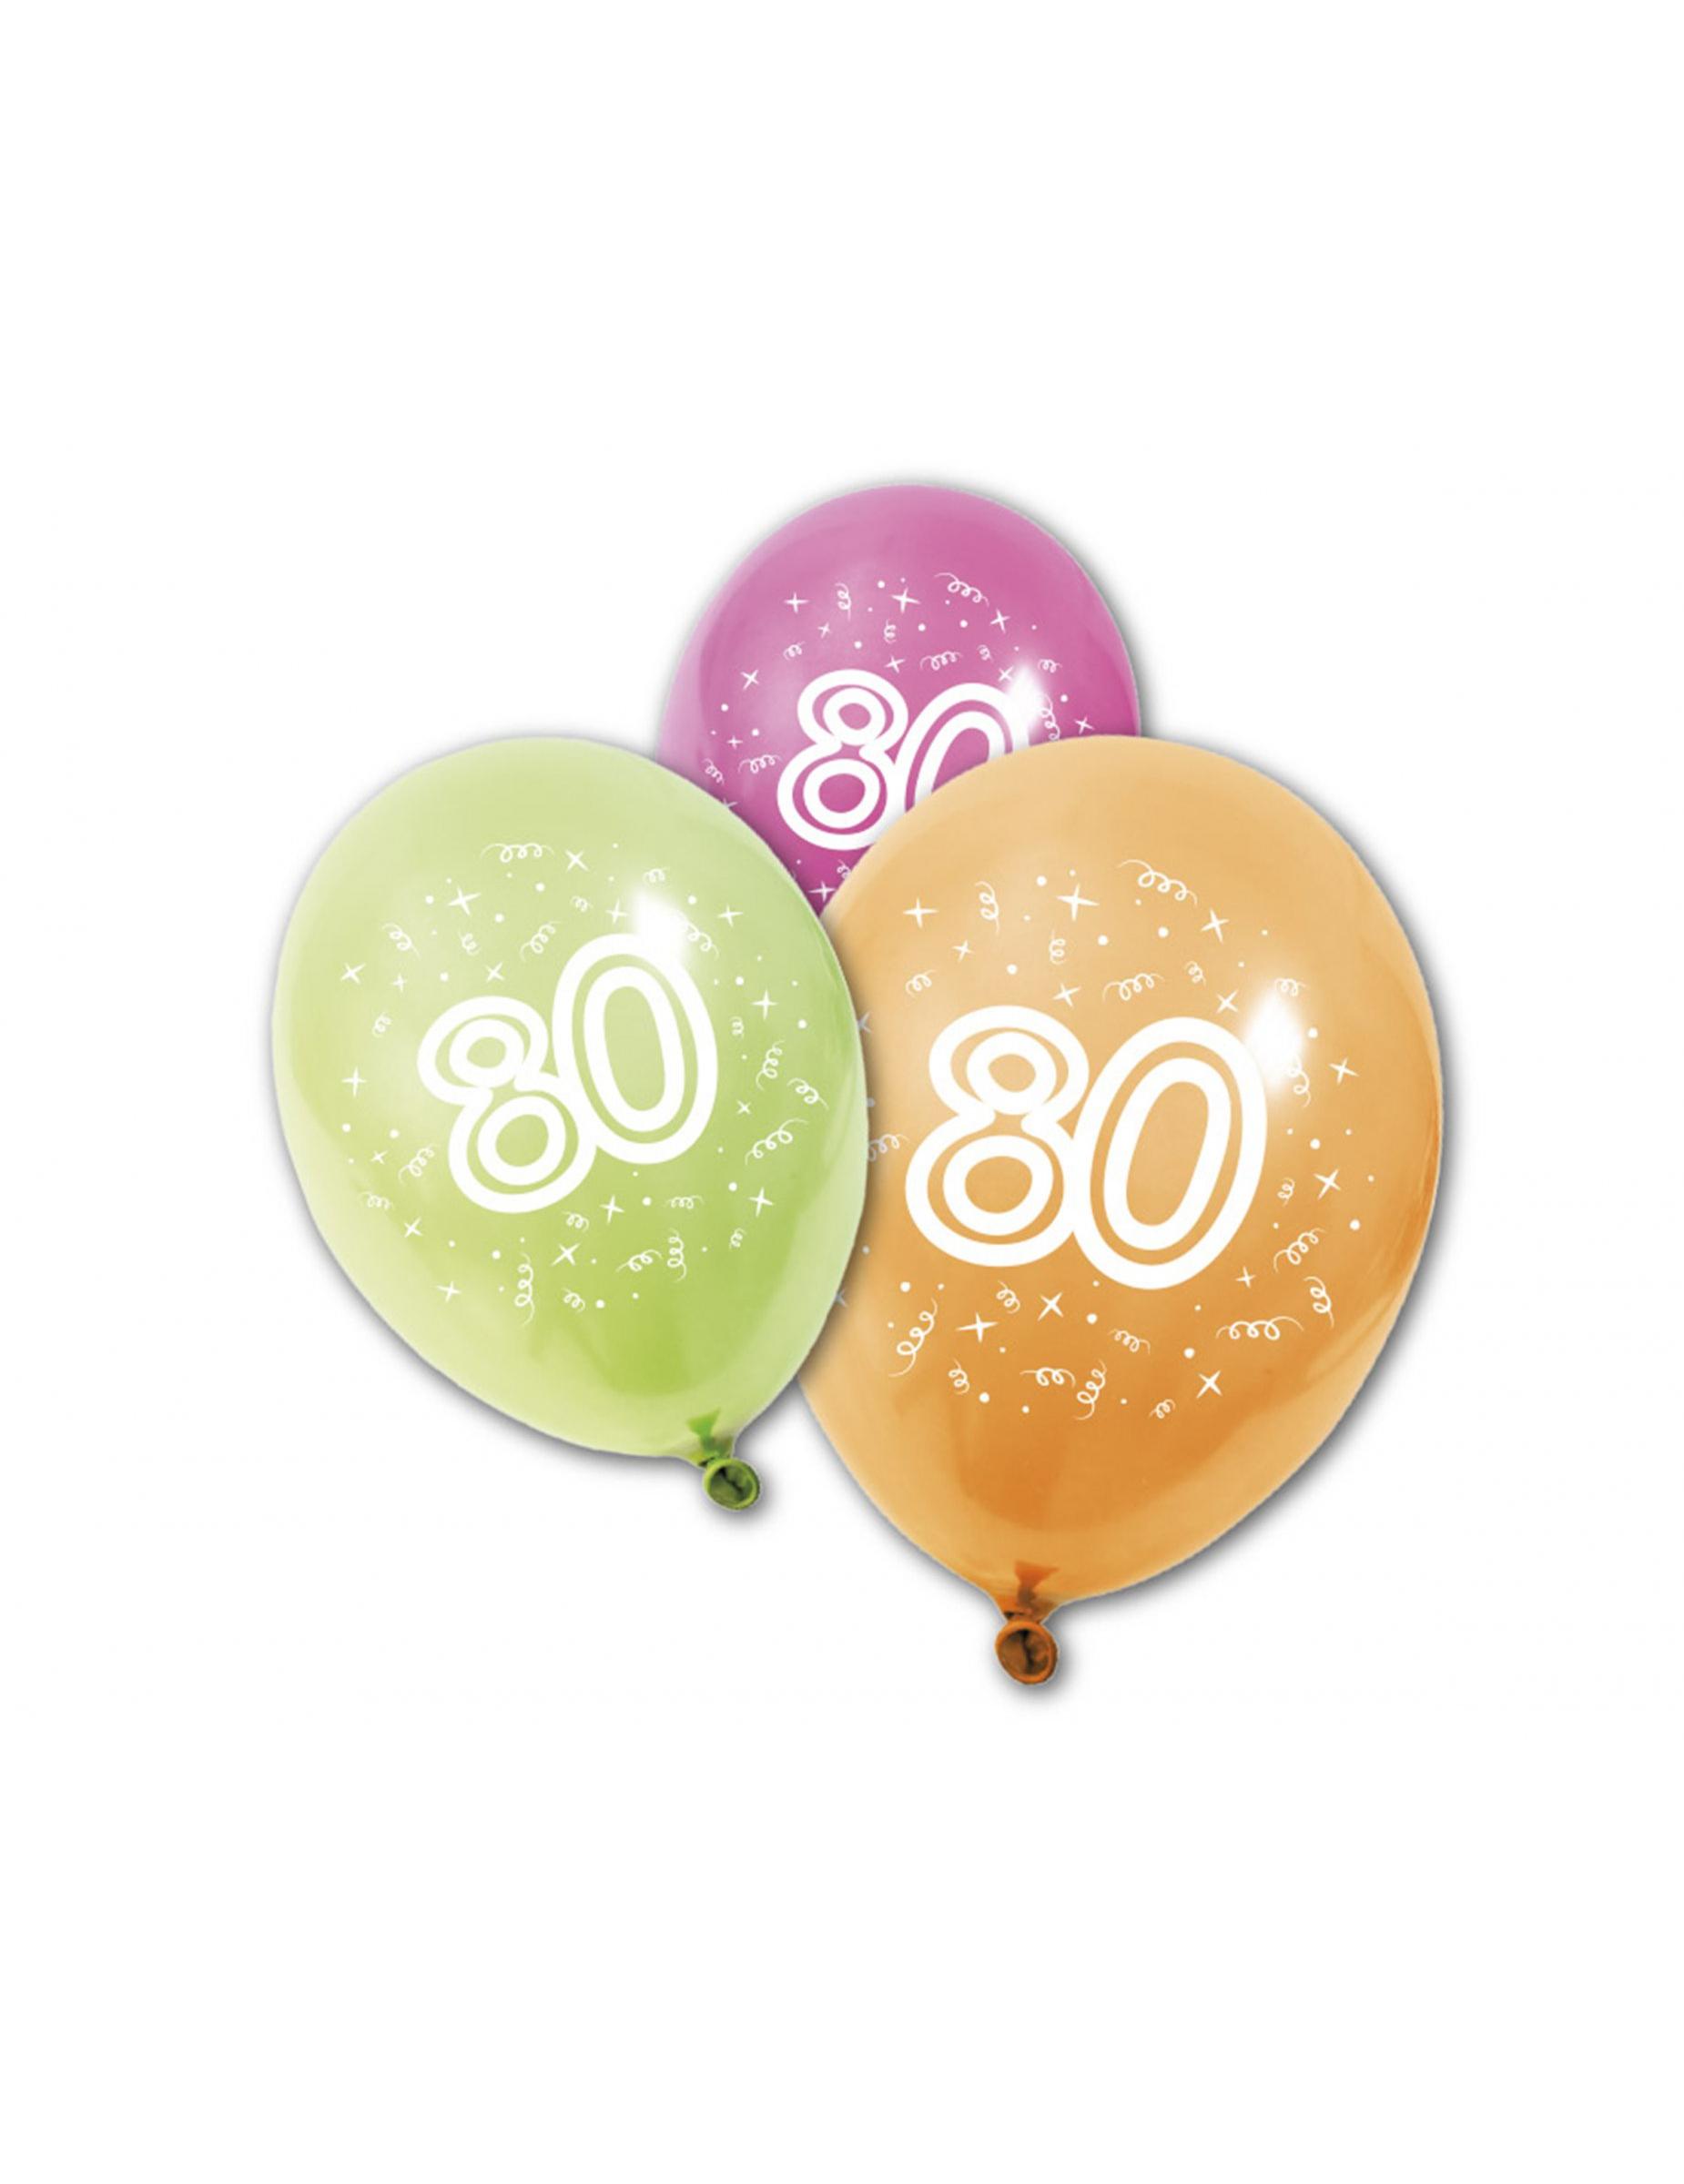 8 globos de cumplea os 80 a os decoraci n y disfraces for Decoracion 80 anos ipuc